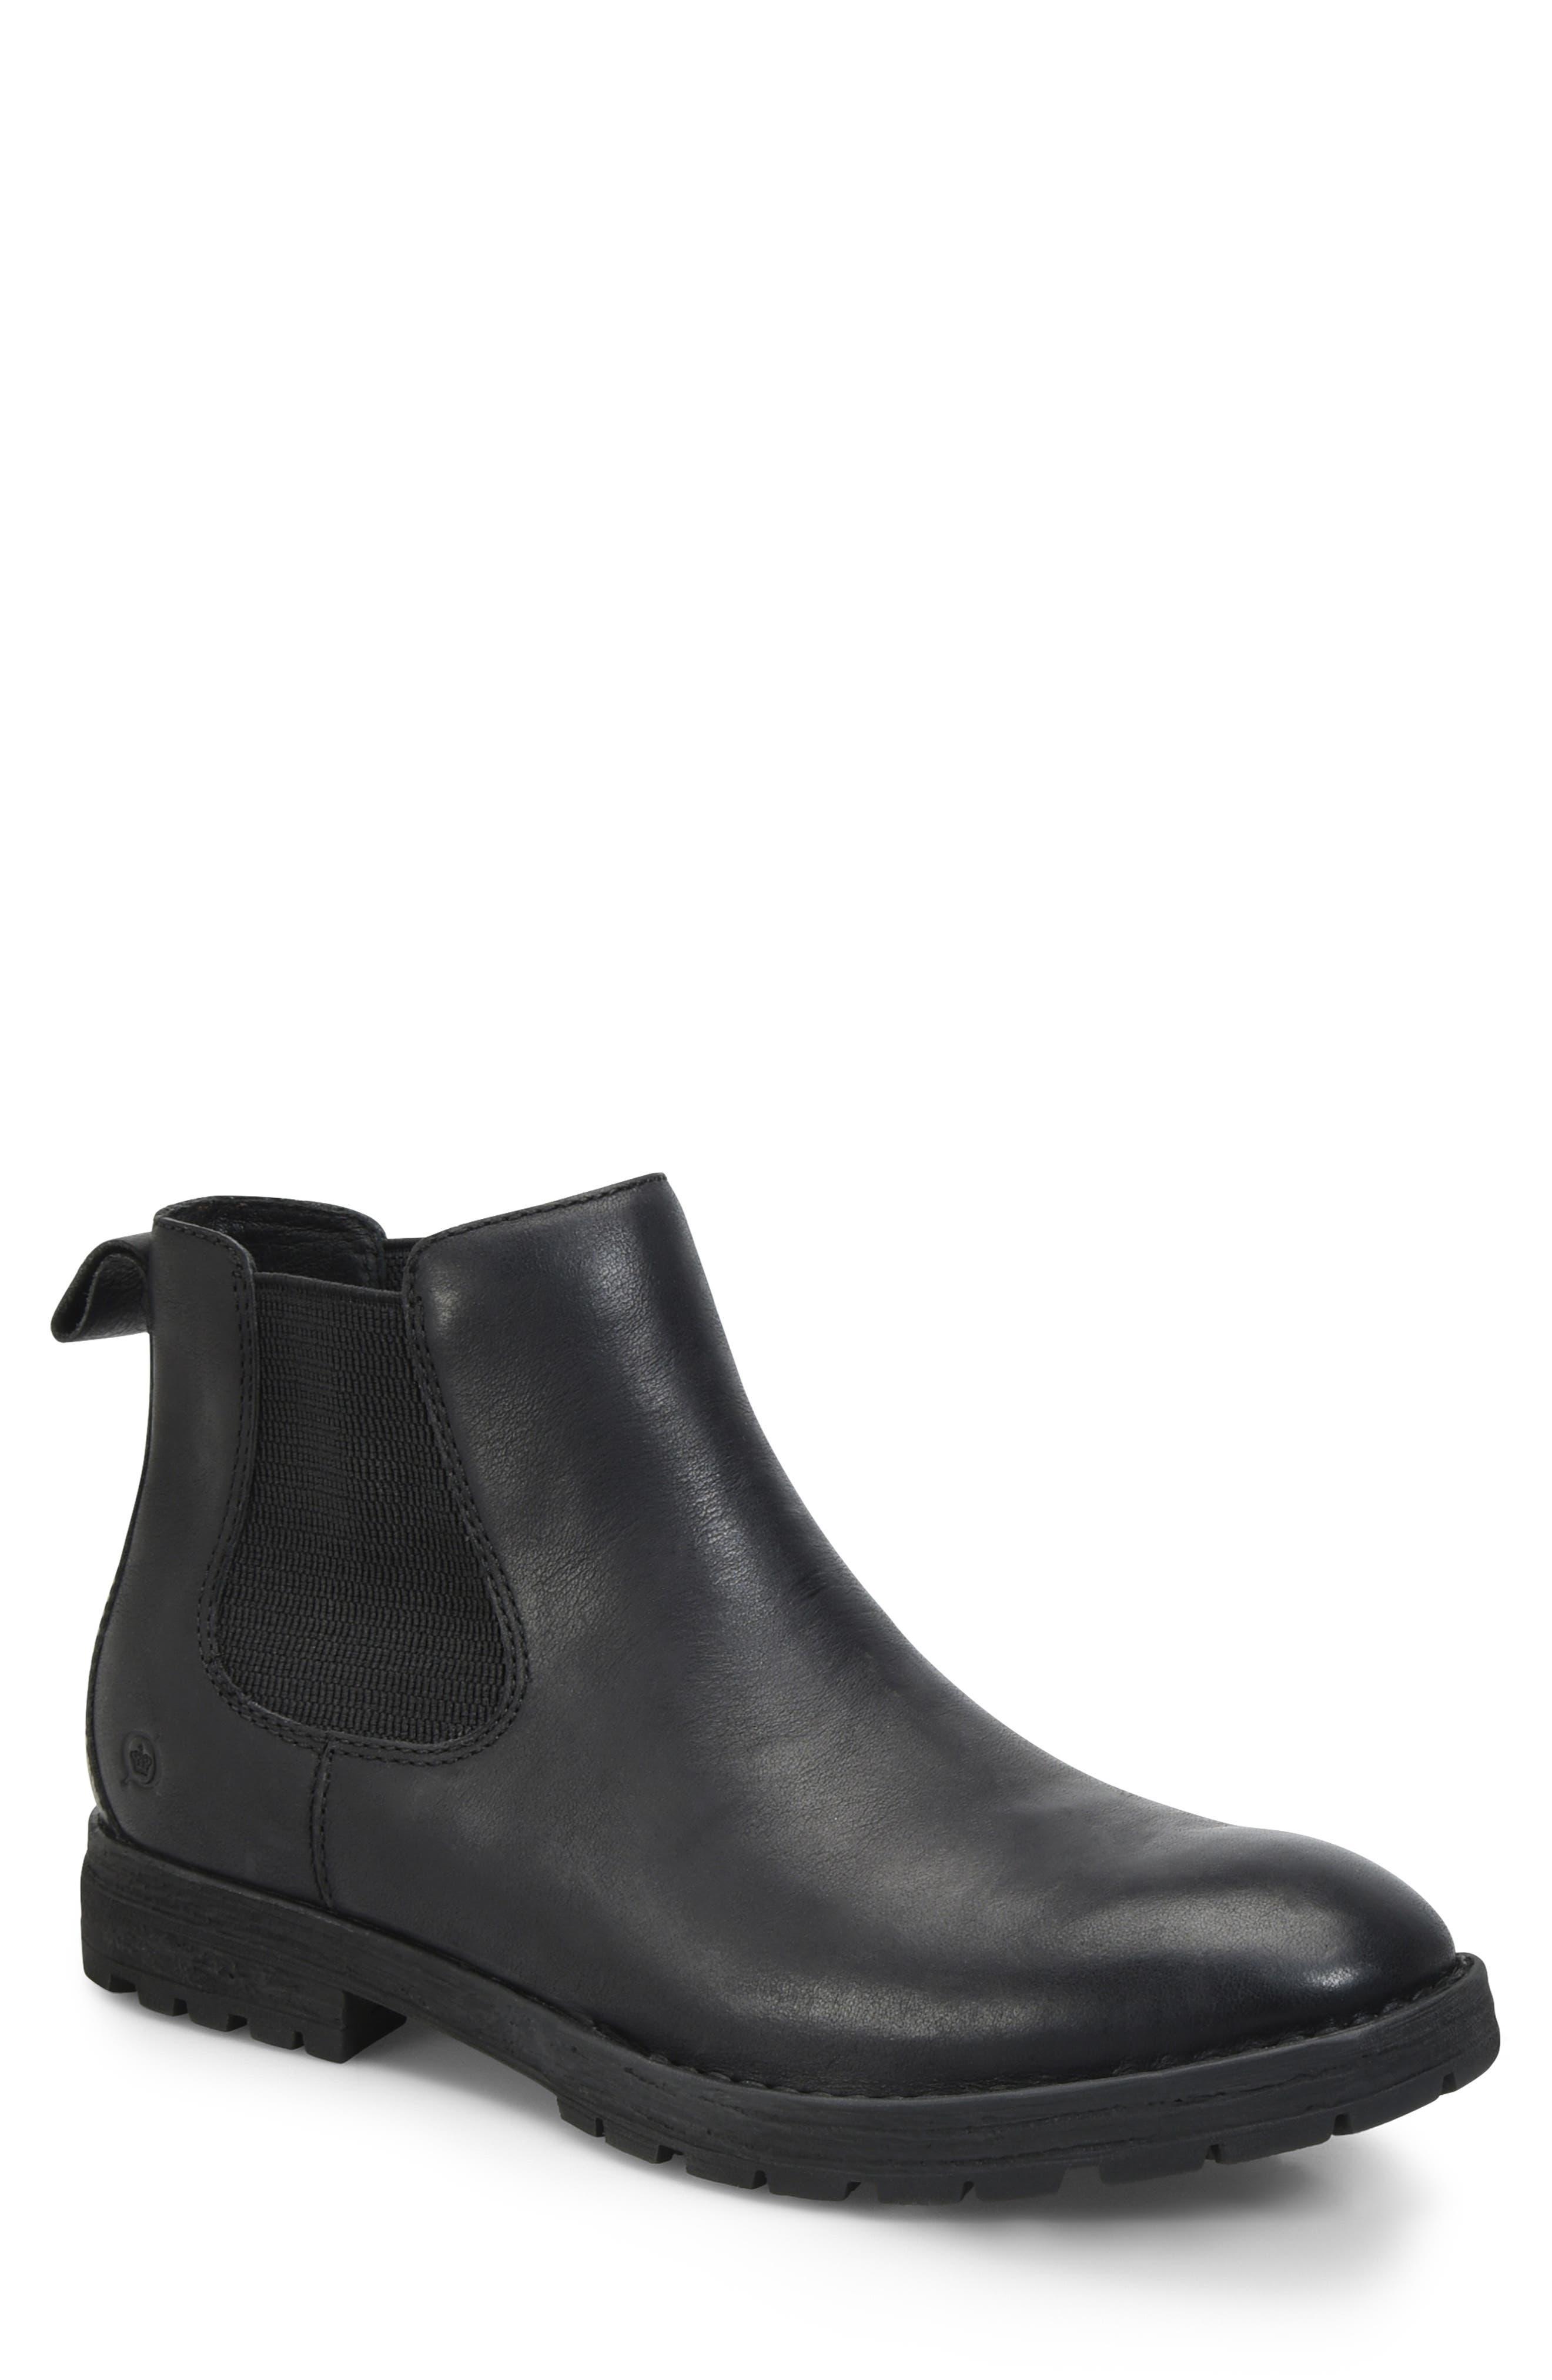 BØRN Luc Chelsea Boot, Main, color, BLACK LEATHER